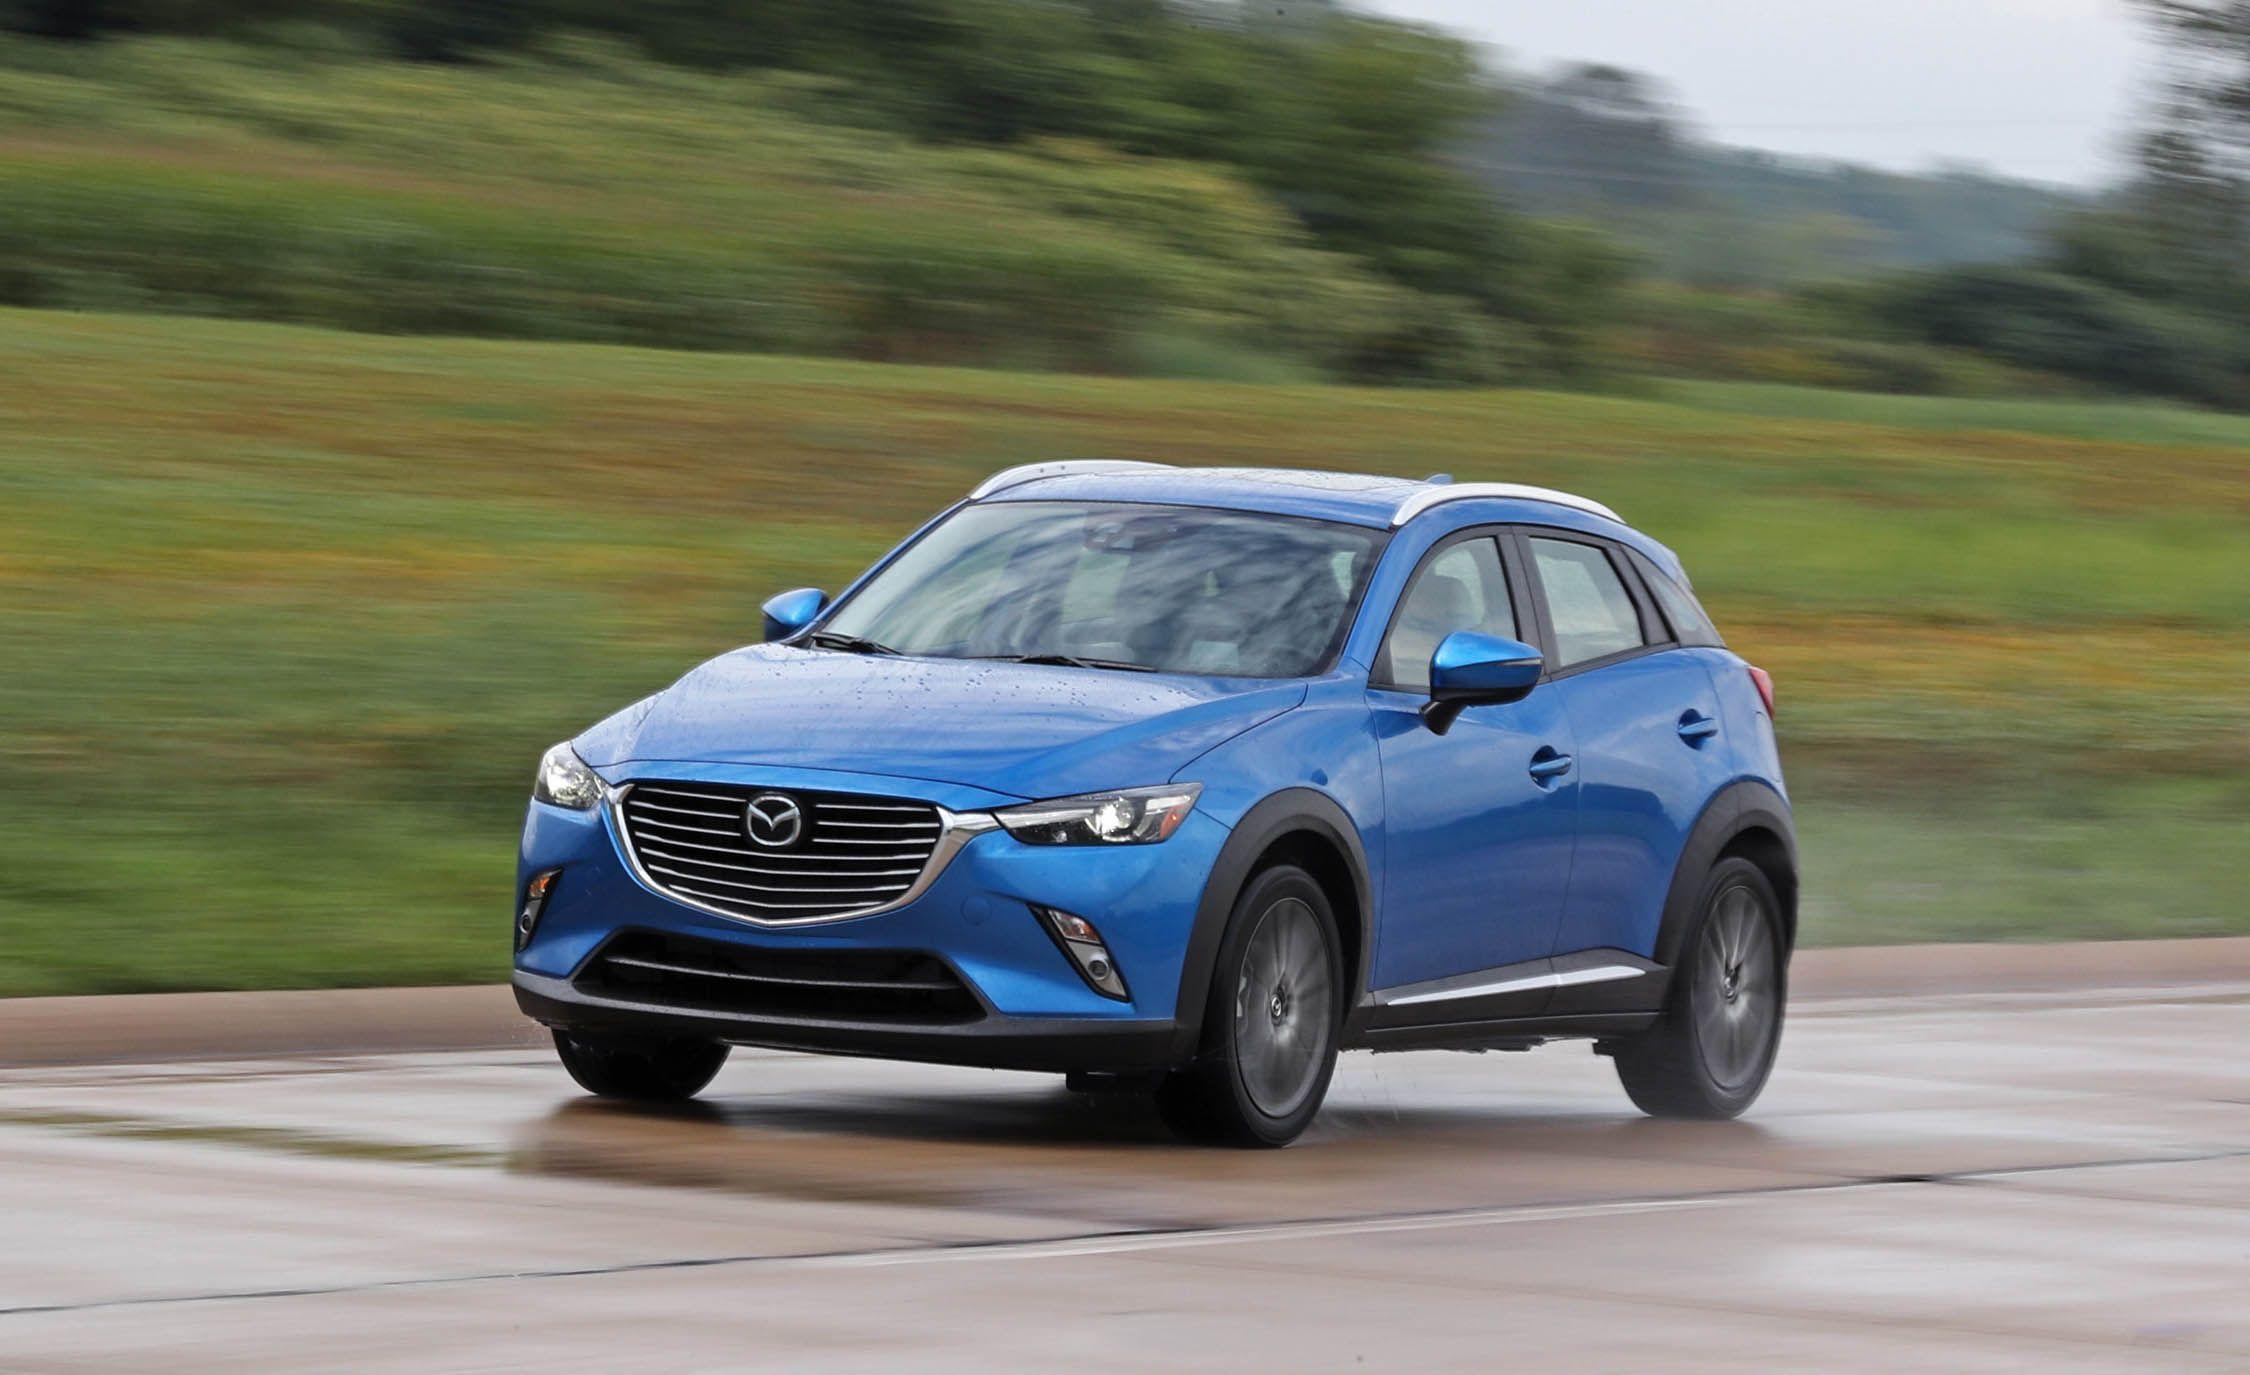 Mazda Cx 3 >> Mazda Cx 3 Reviews Mazda Cx 3 Price Photos And Specs Car And